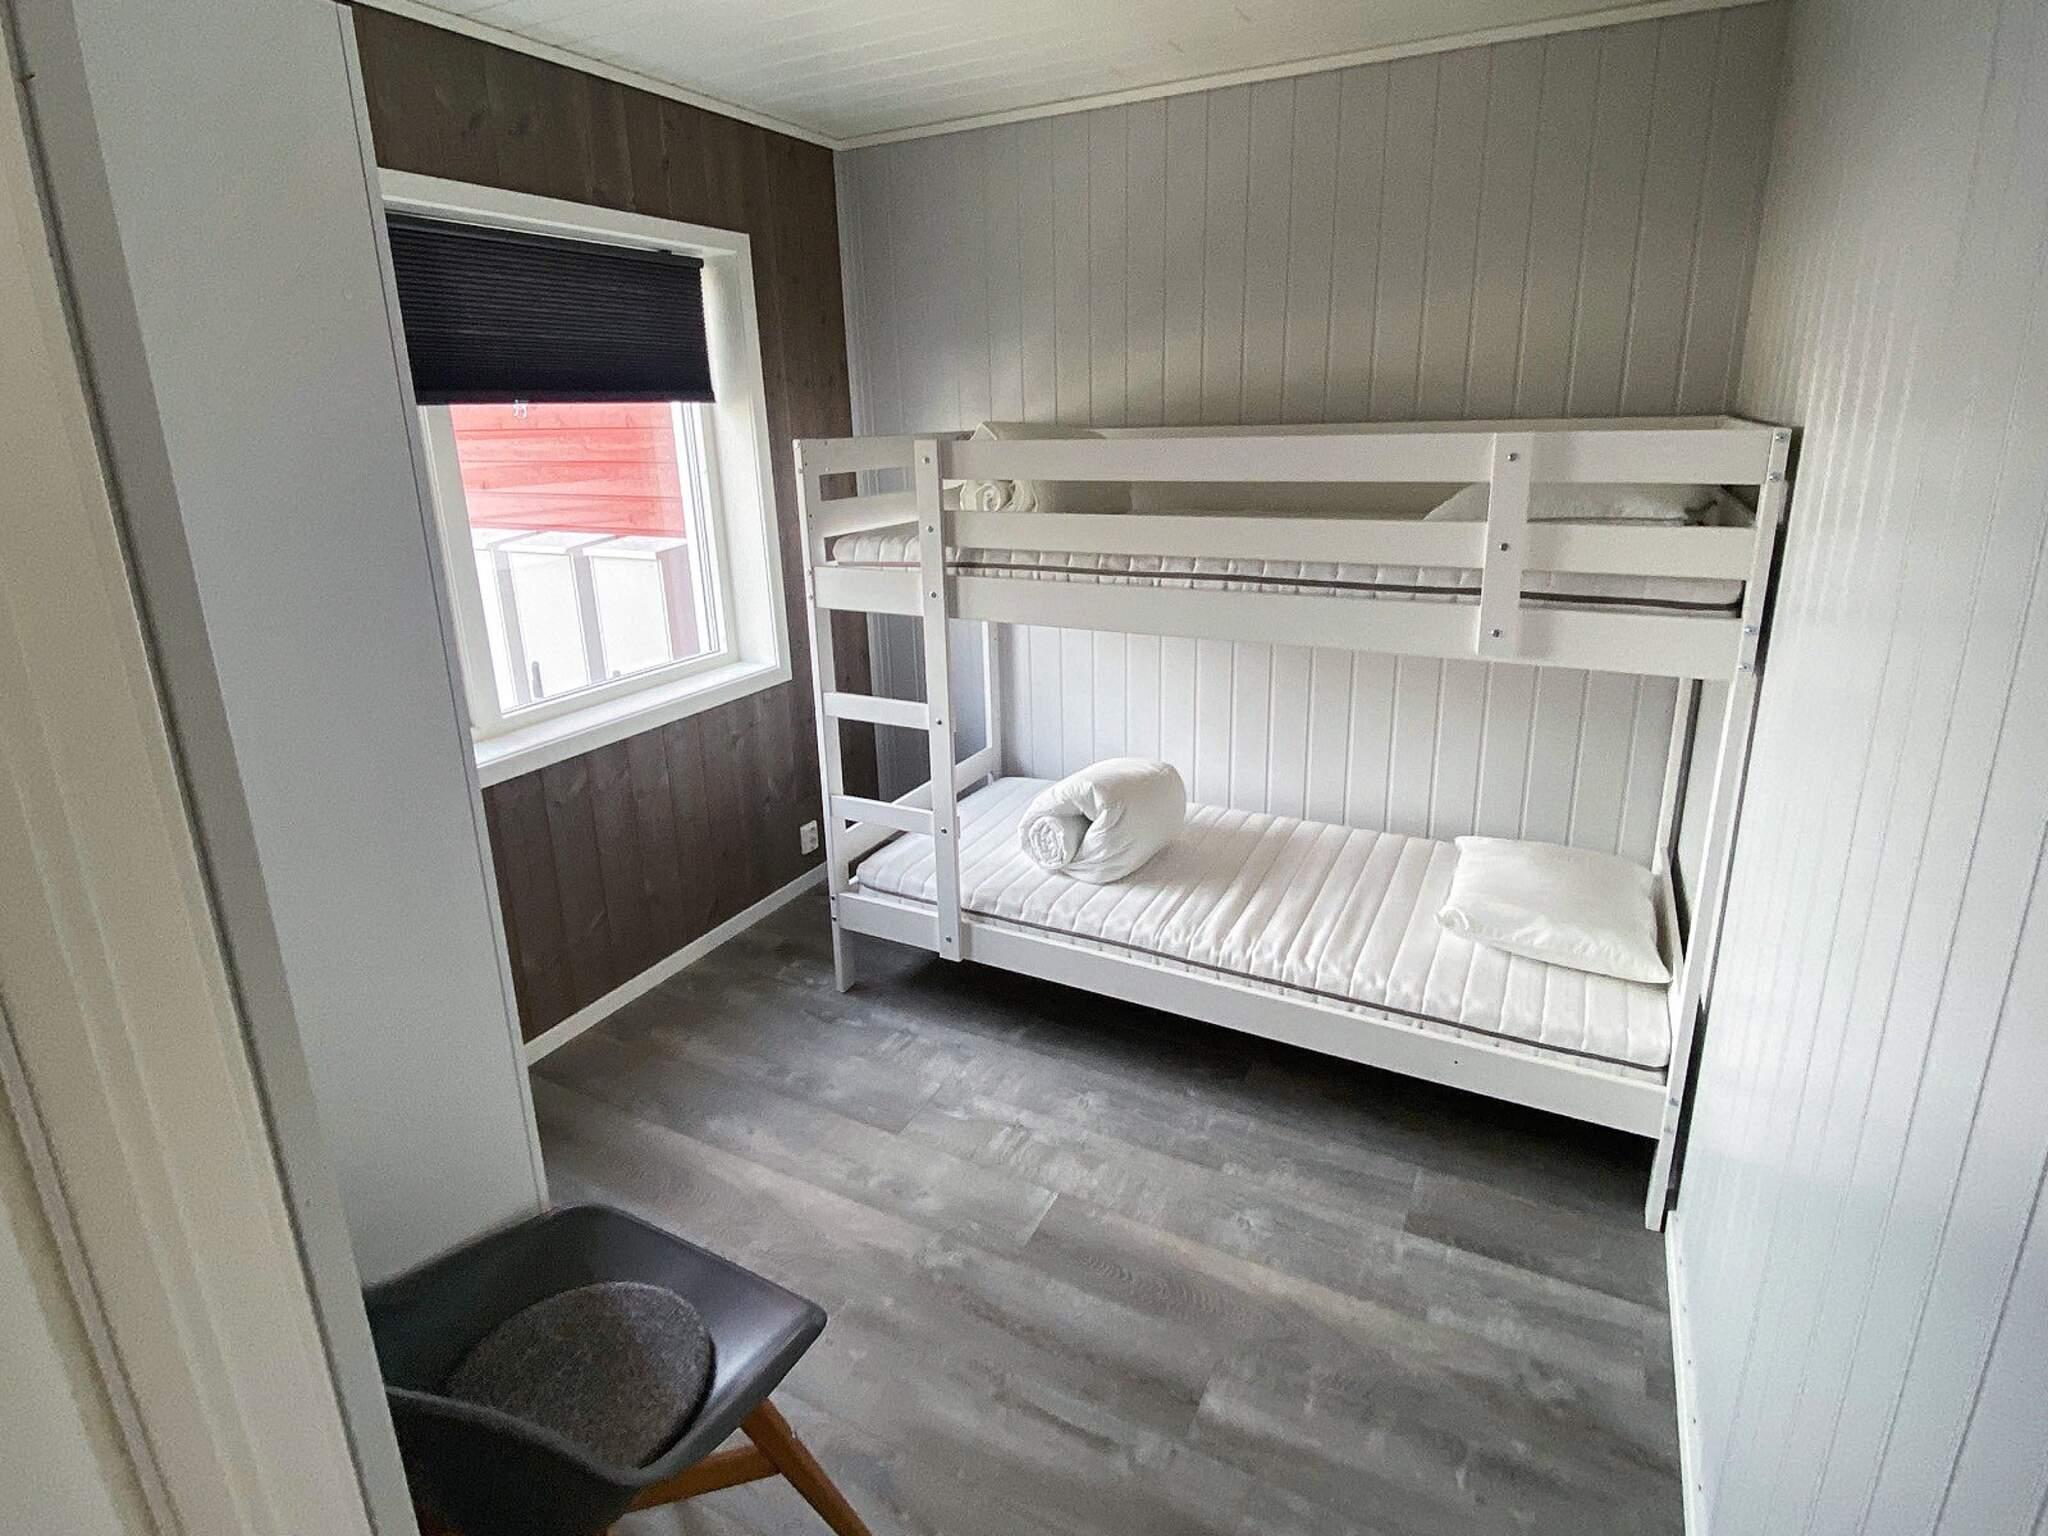 Ferienhaus Sandøy (2789401), Sandøy, More - Romsdal, Westnorwegen, Norwegen, Bild 11